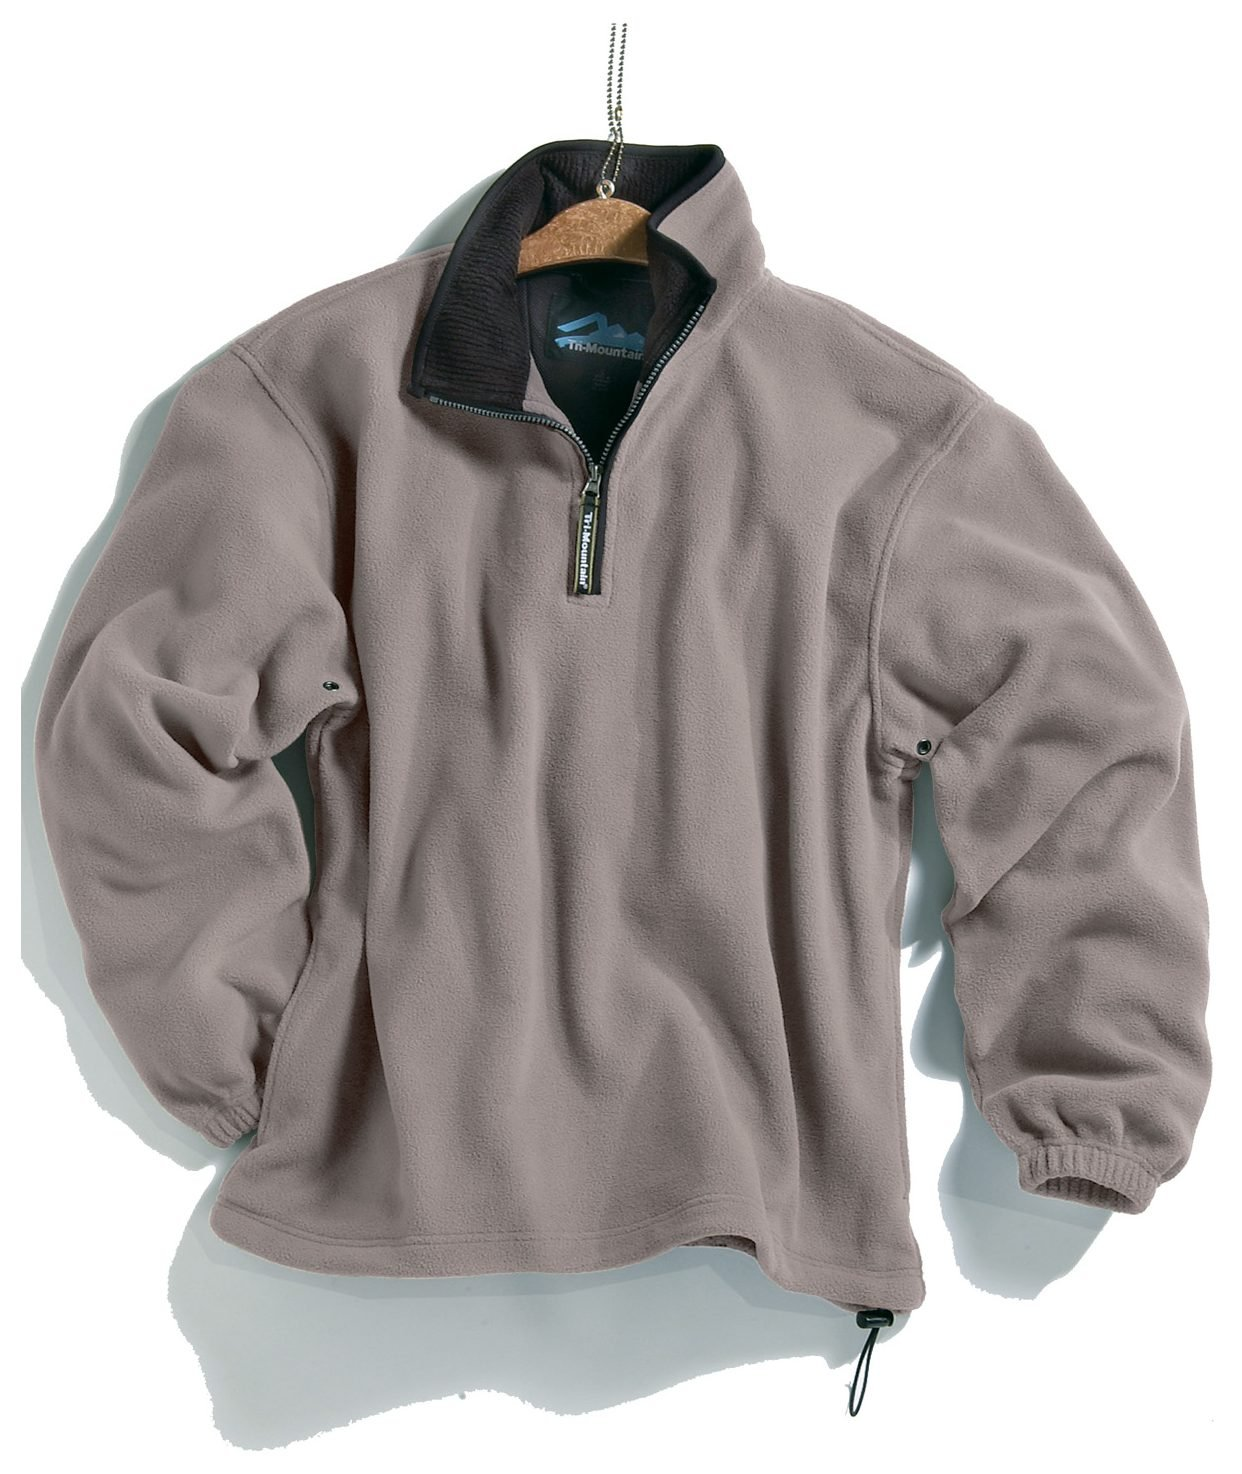 Tri-mountain Micro fleece 1/4 zip pullover. 7100TM - HEATHER GRAY / BLACK_L